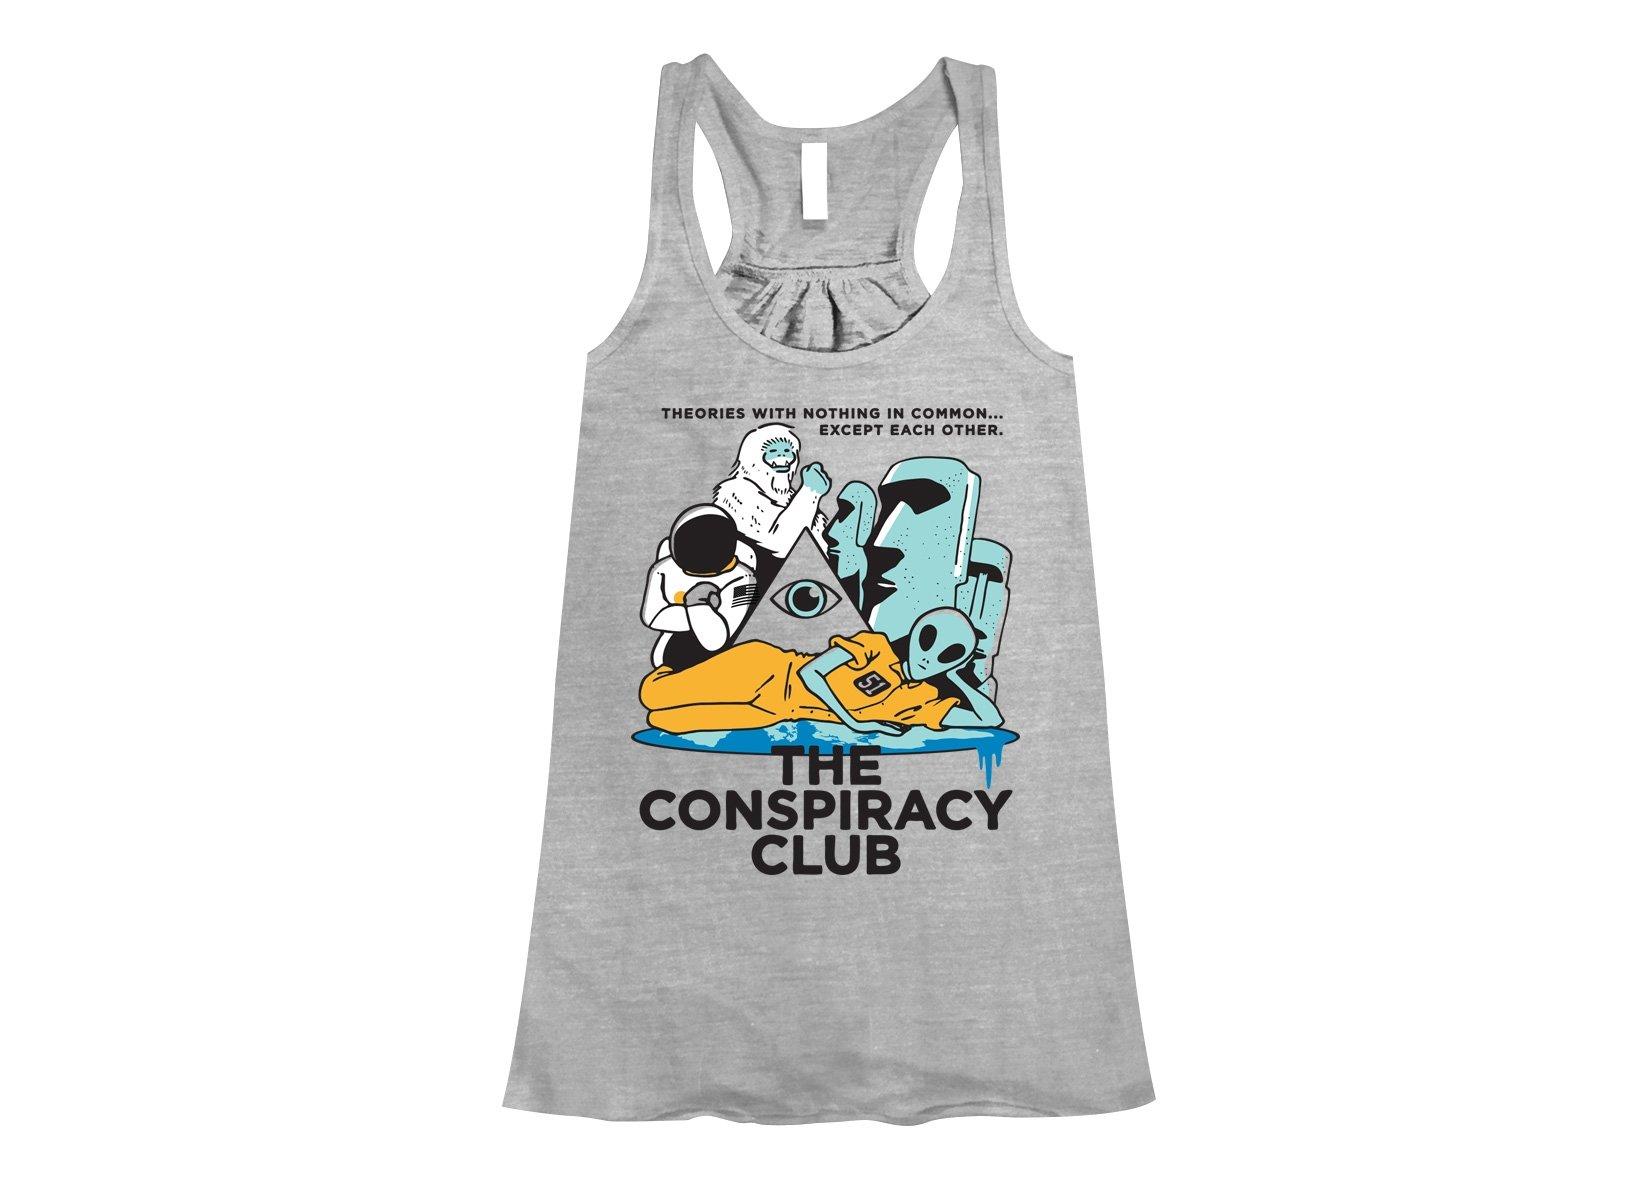 The Conspiracy Club on Womens Tanks T-Shirt